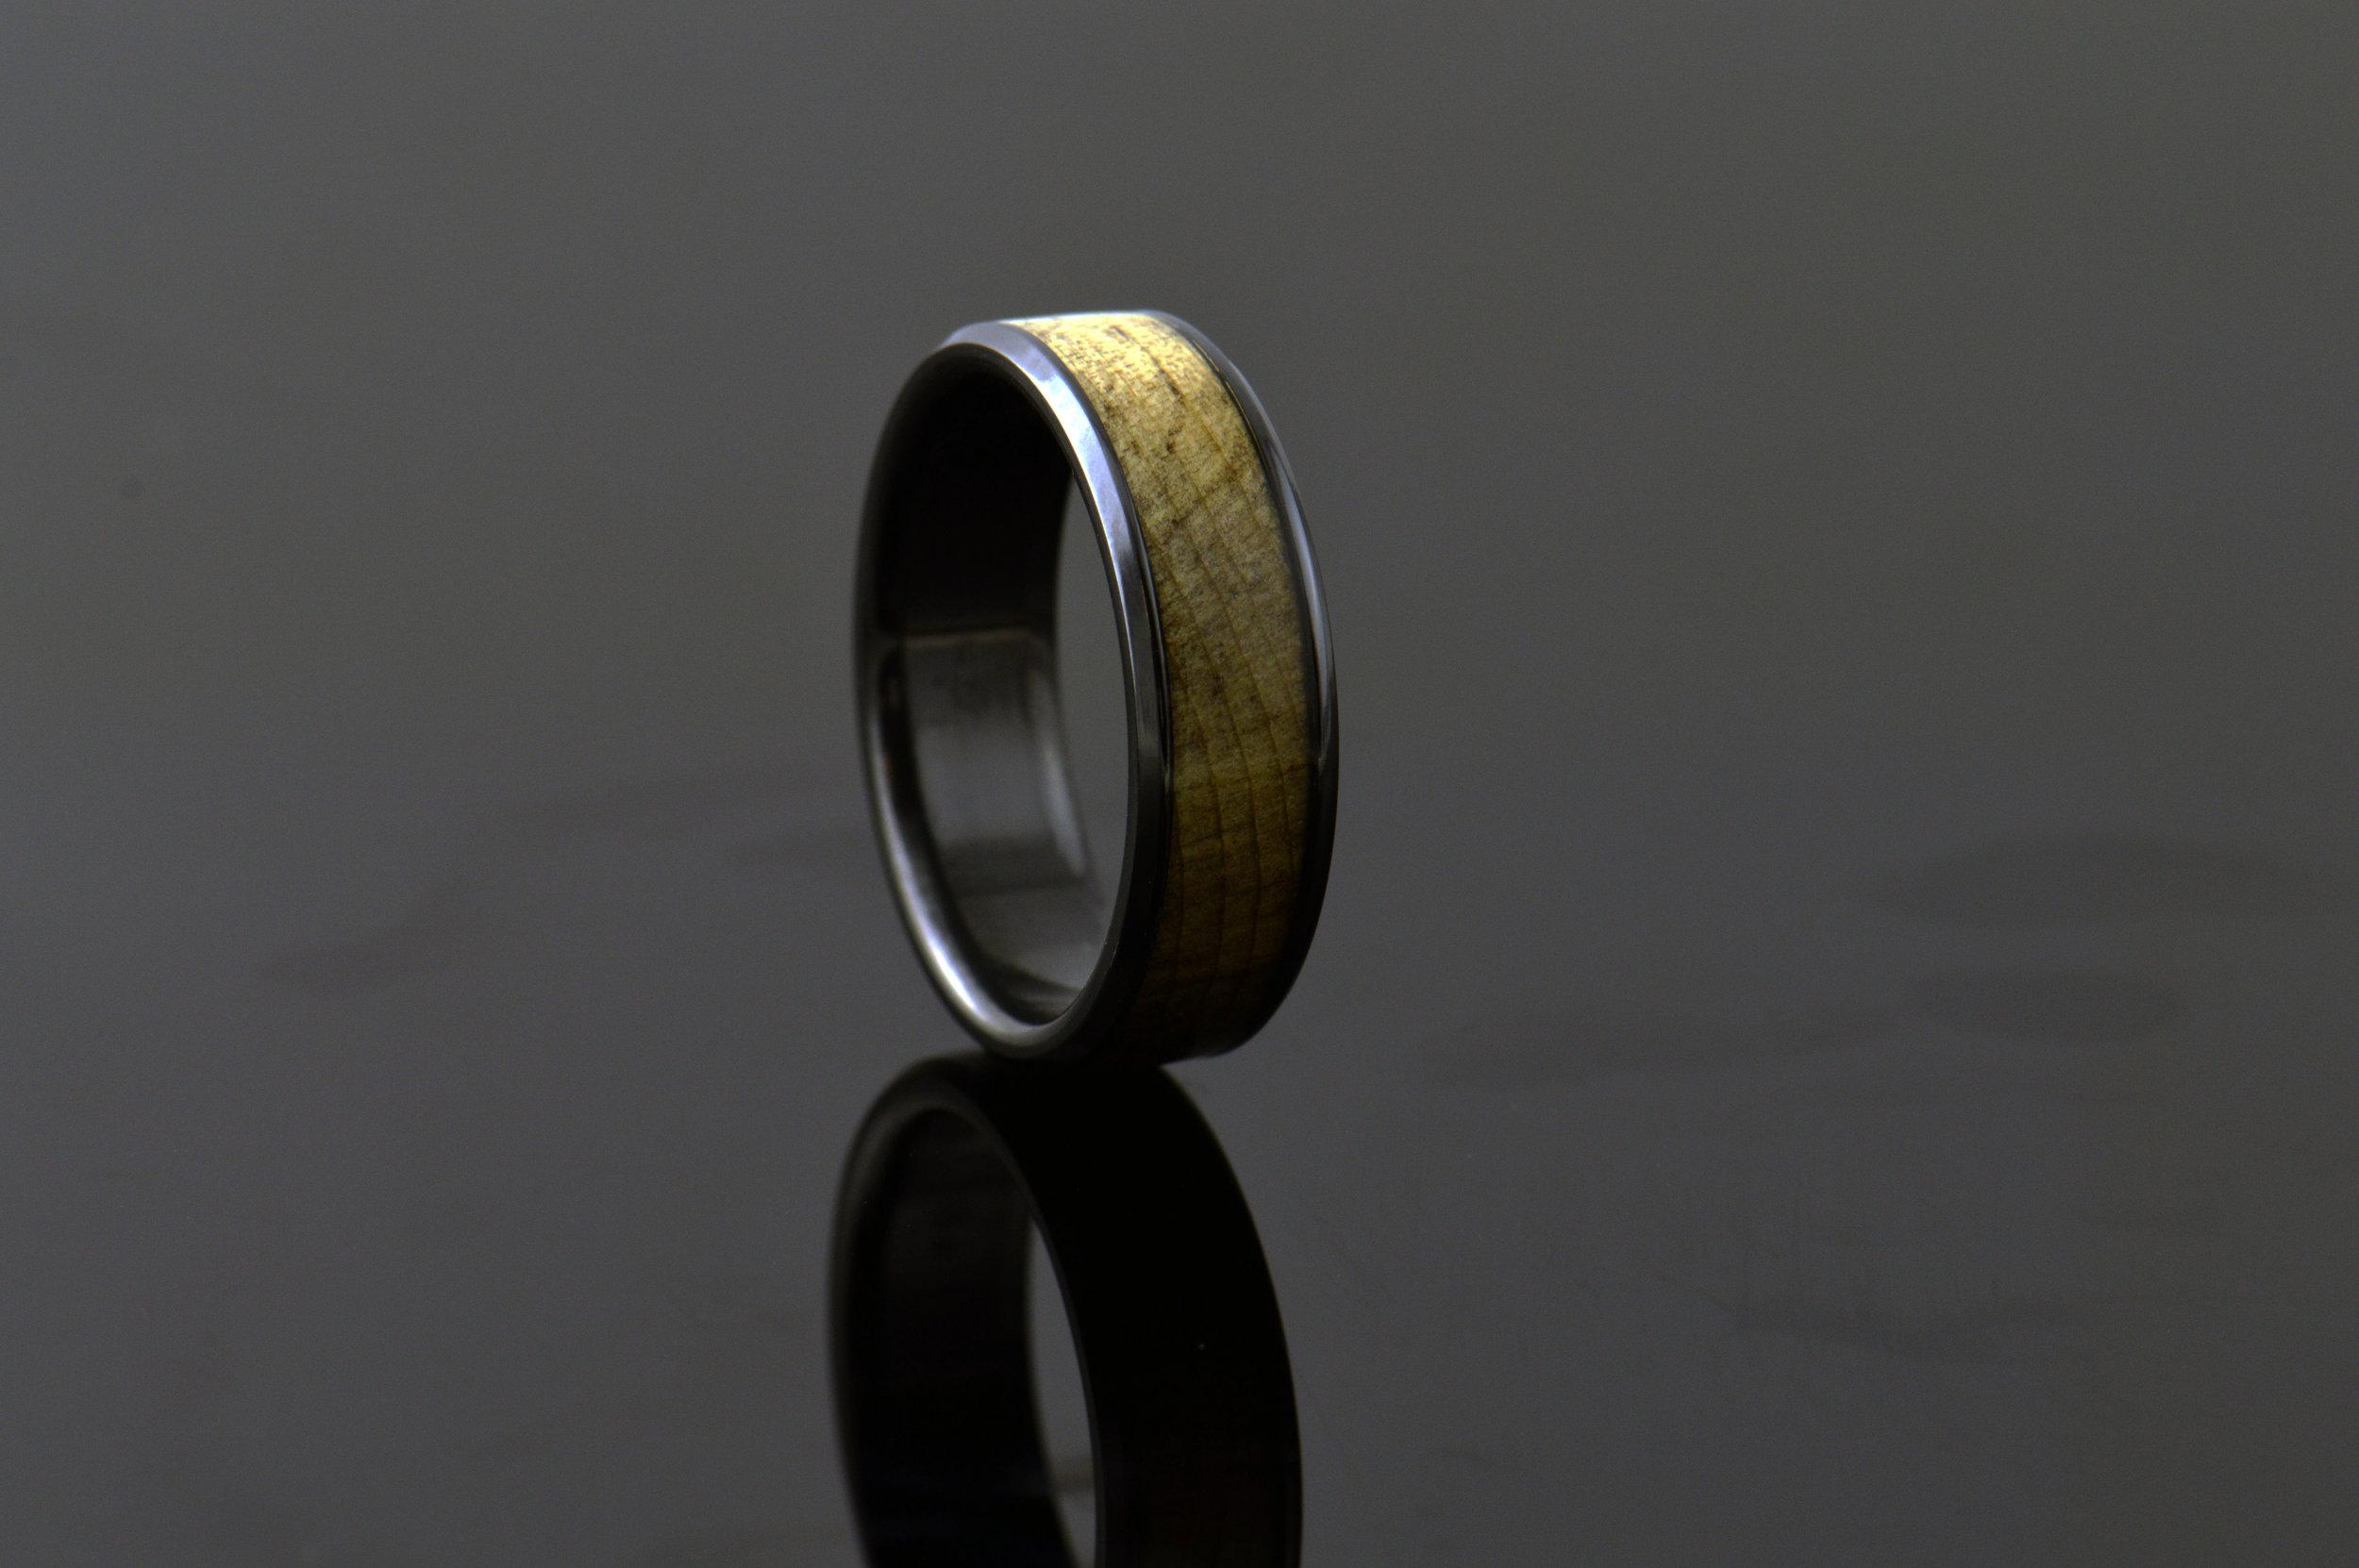 darvier-Colorado-beetle-kill-pine-zirconium-wedding-ring.JPG